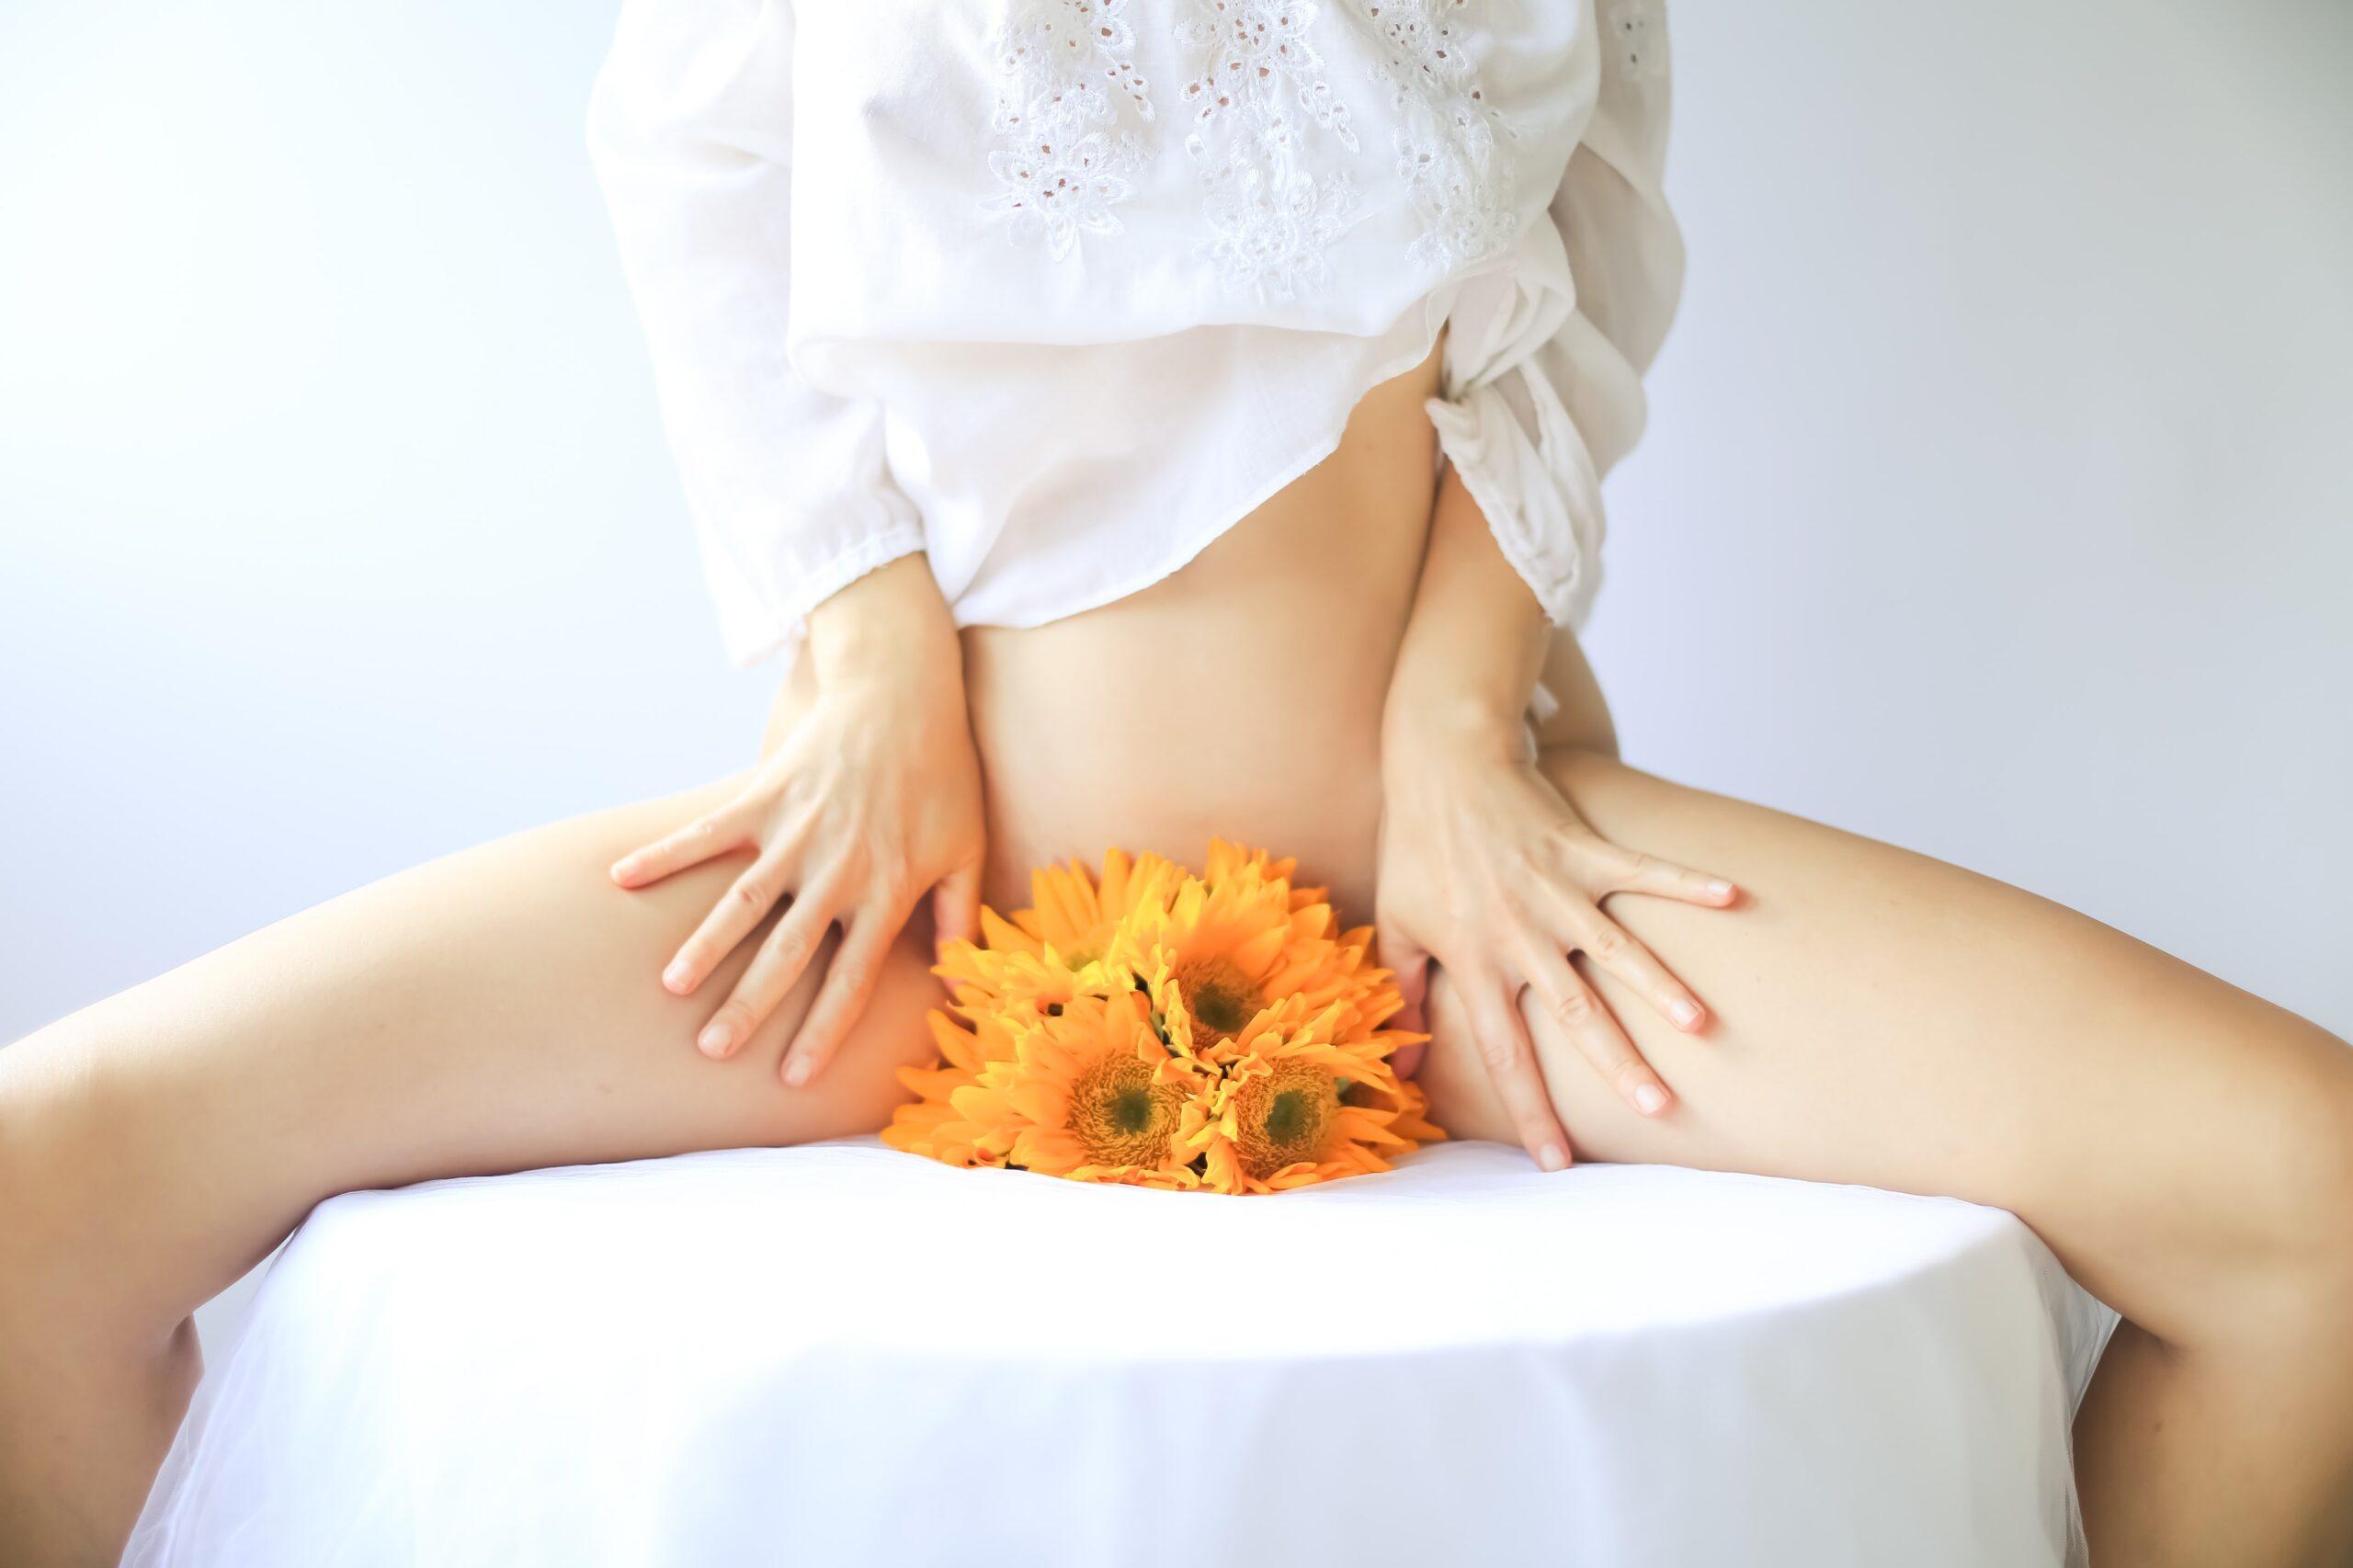 ava-sol-Woman with orange daisy blossoms held between legs -unsplash